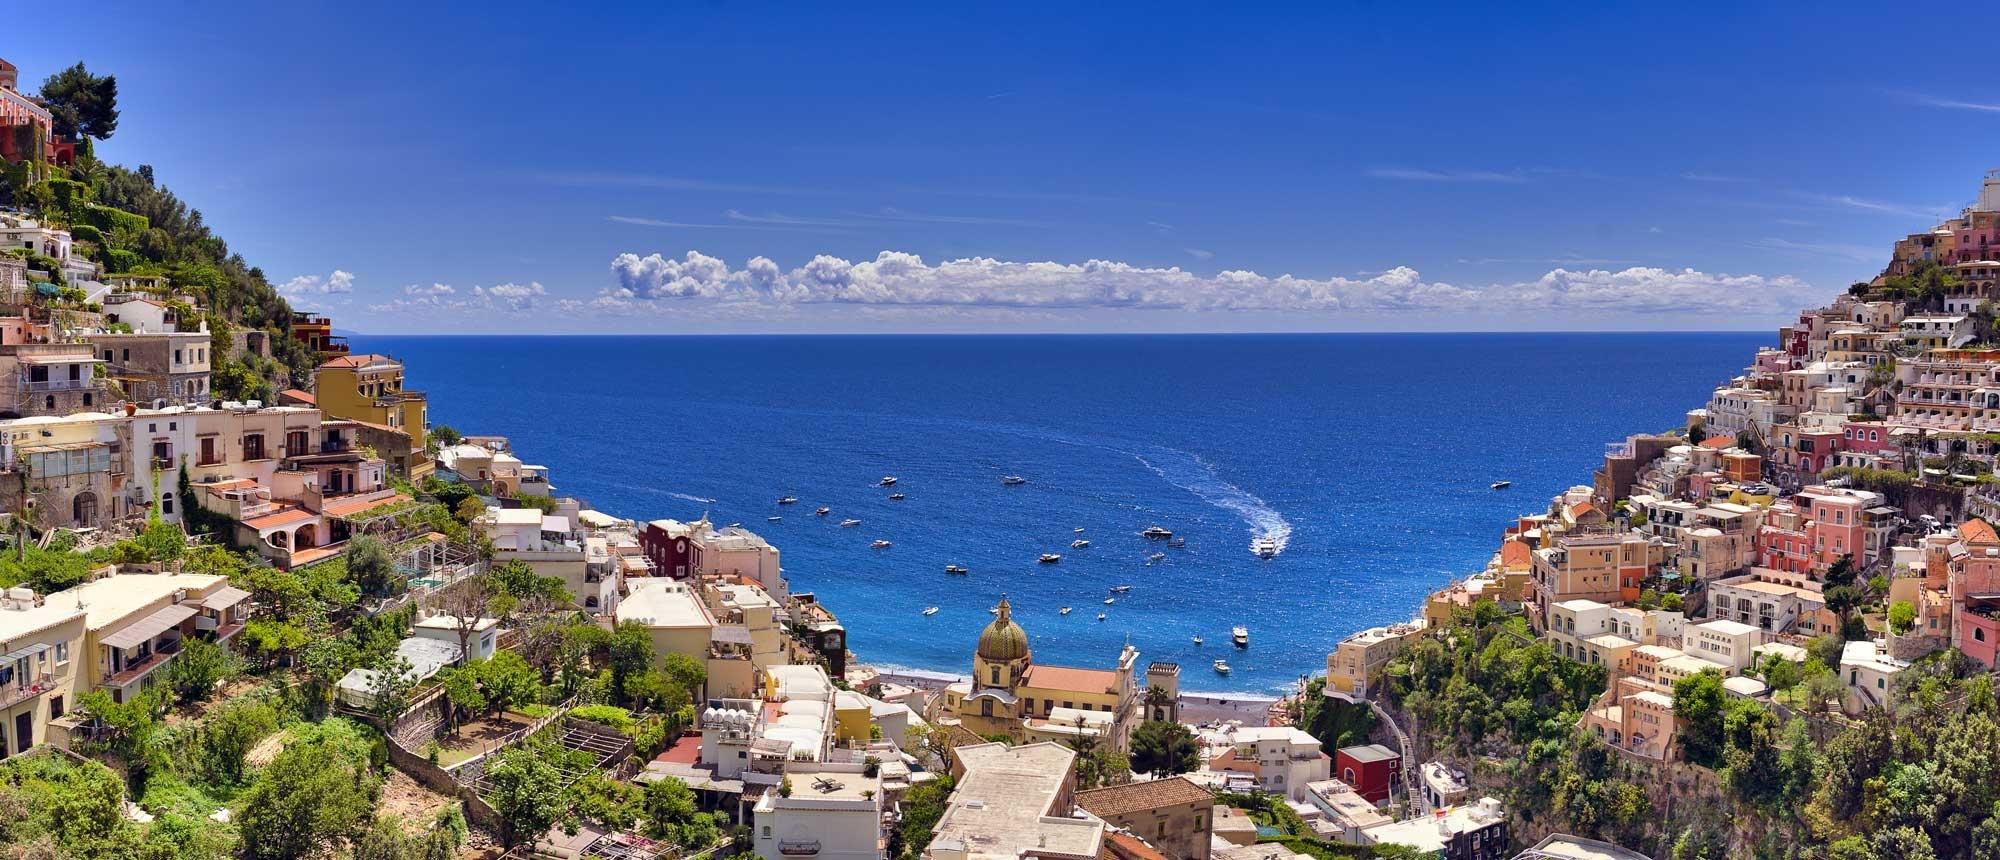 Luxury Car Rental in Amalfi Coast